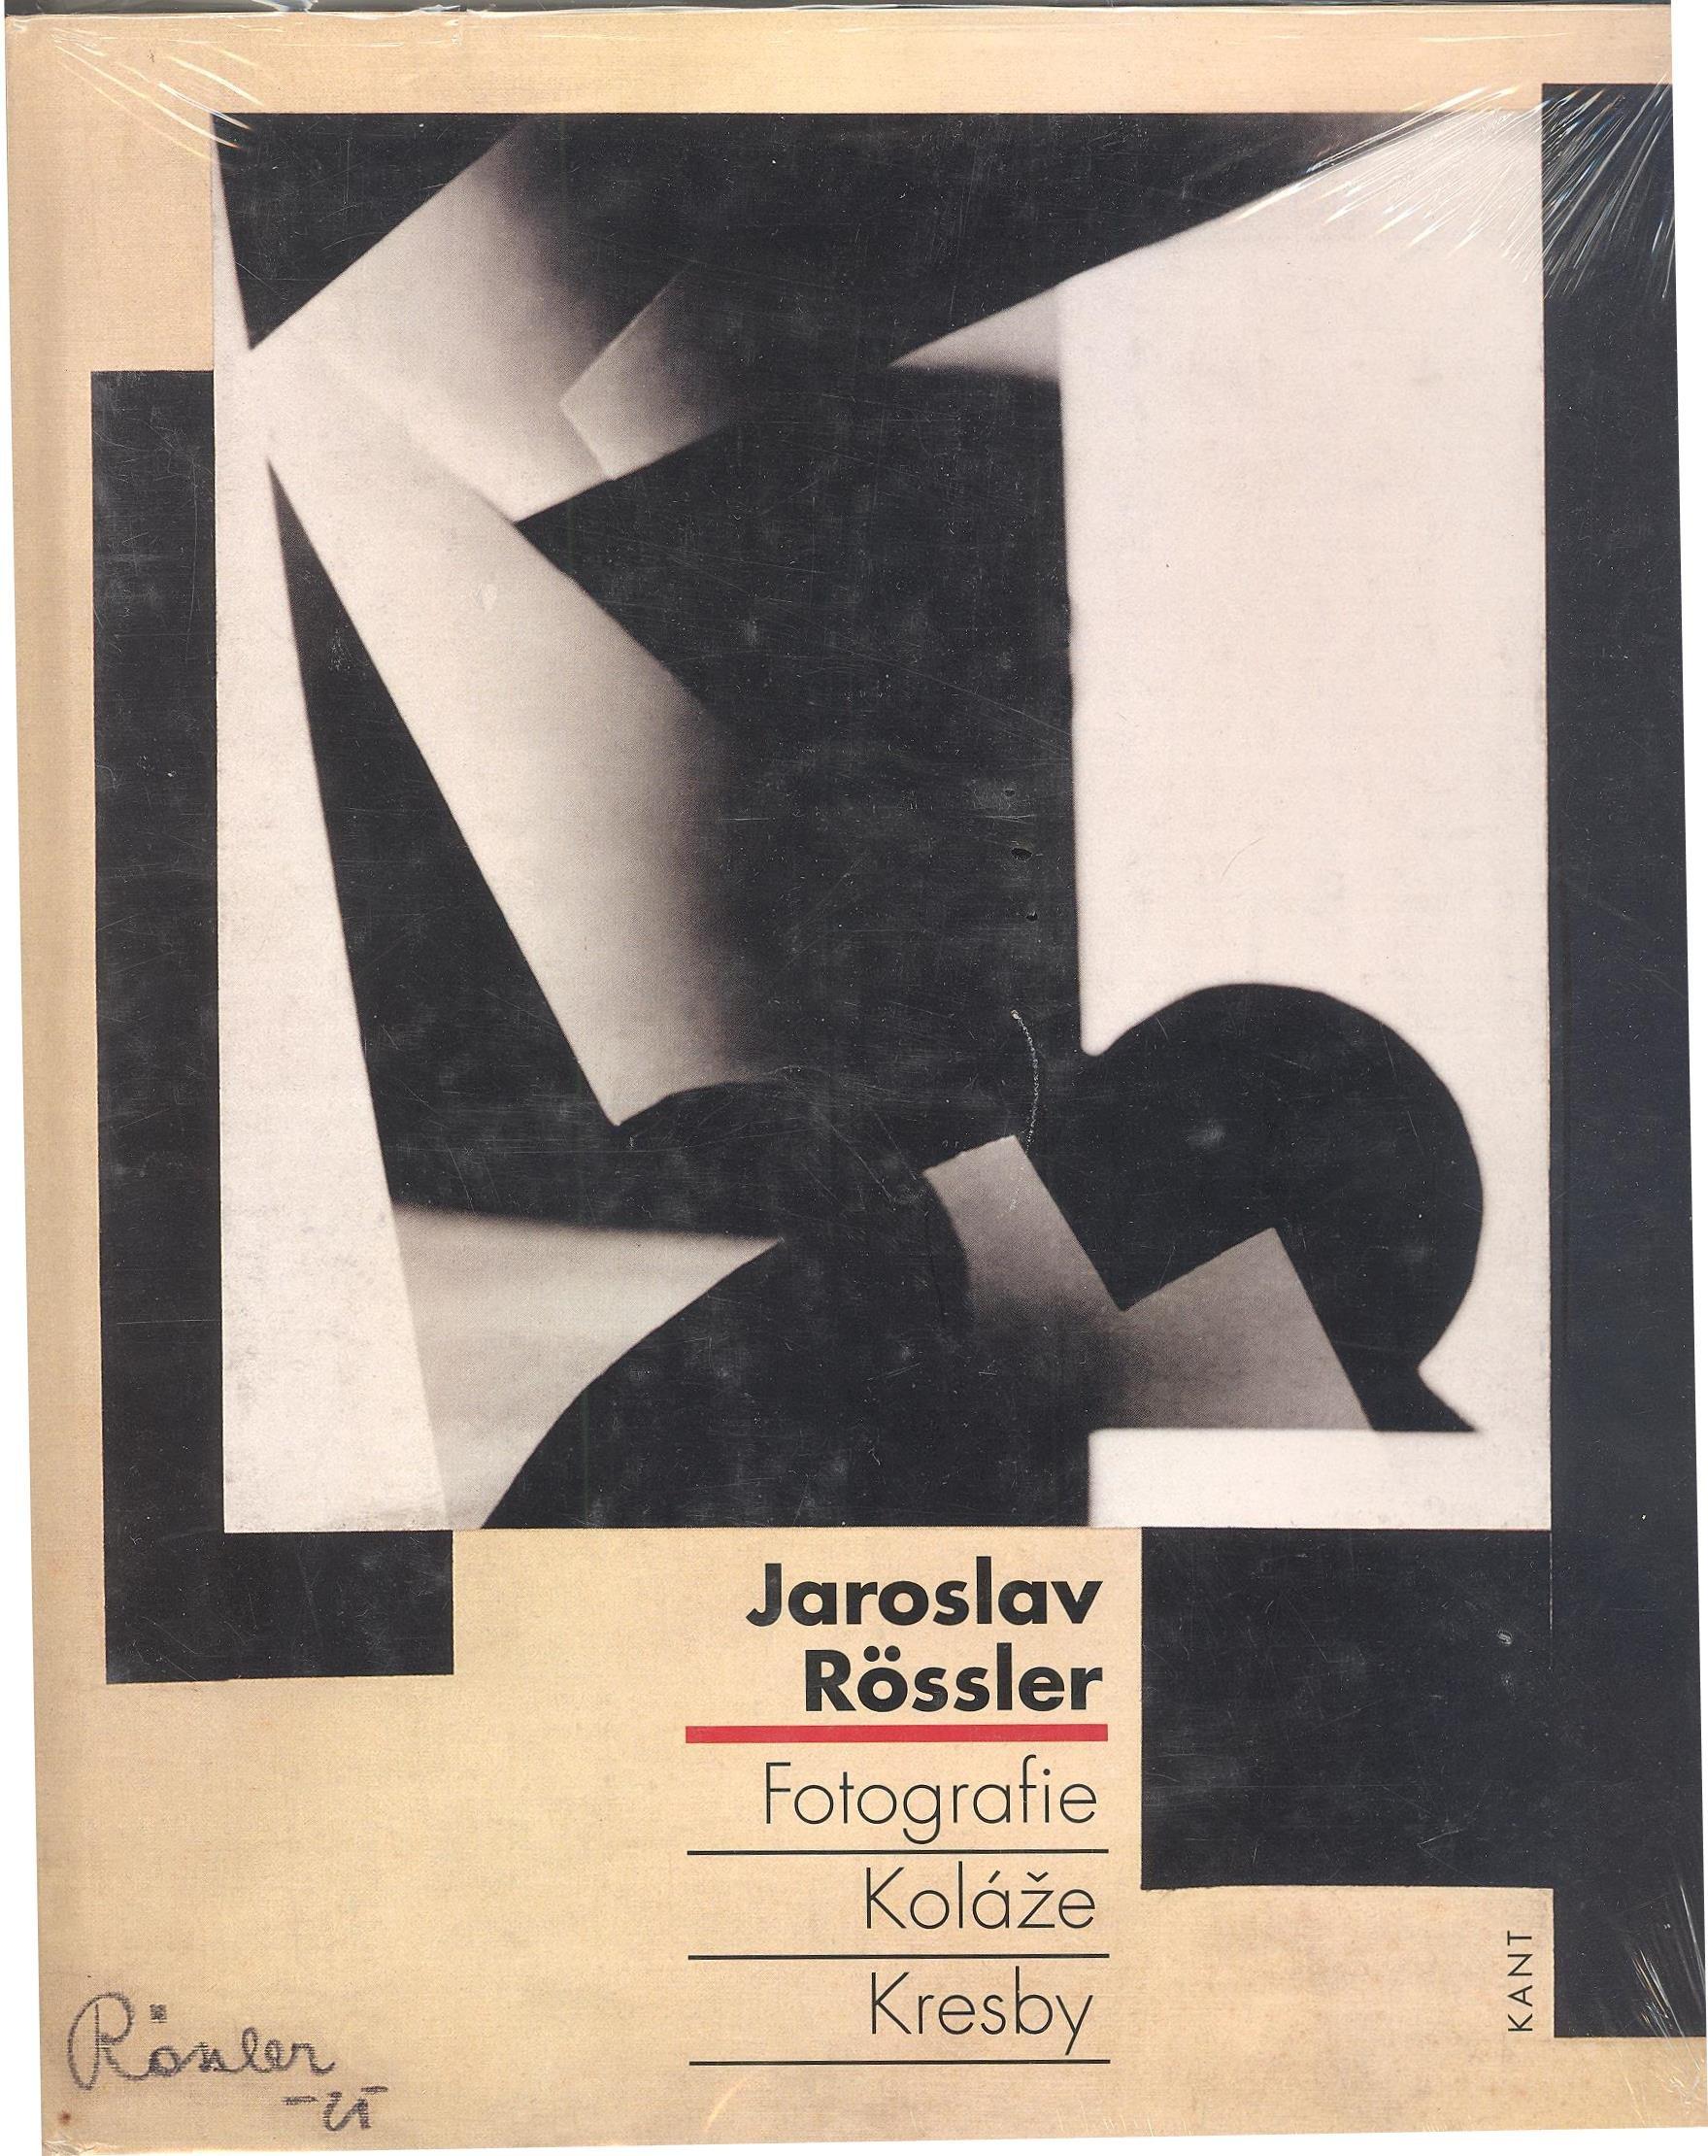 Jaroslav Rossler Fotografie Kolaze Kresby Vladimir And Mlcoch